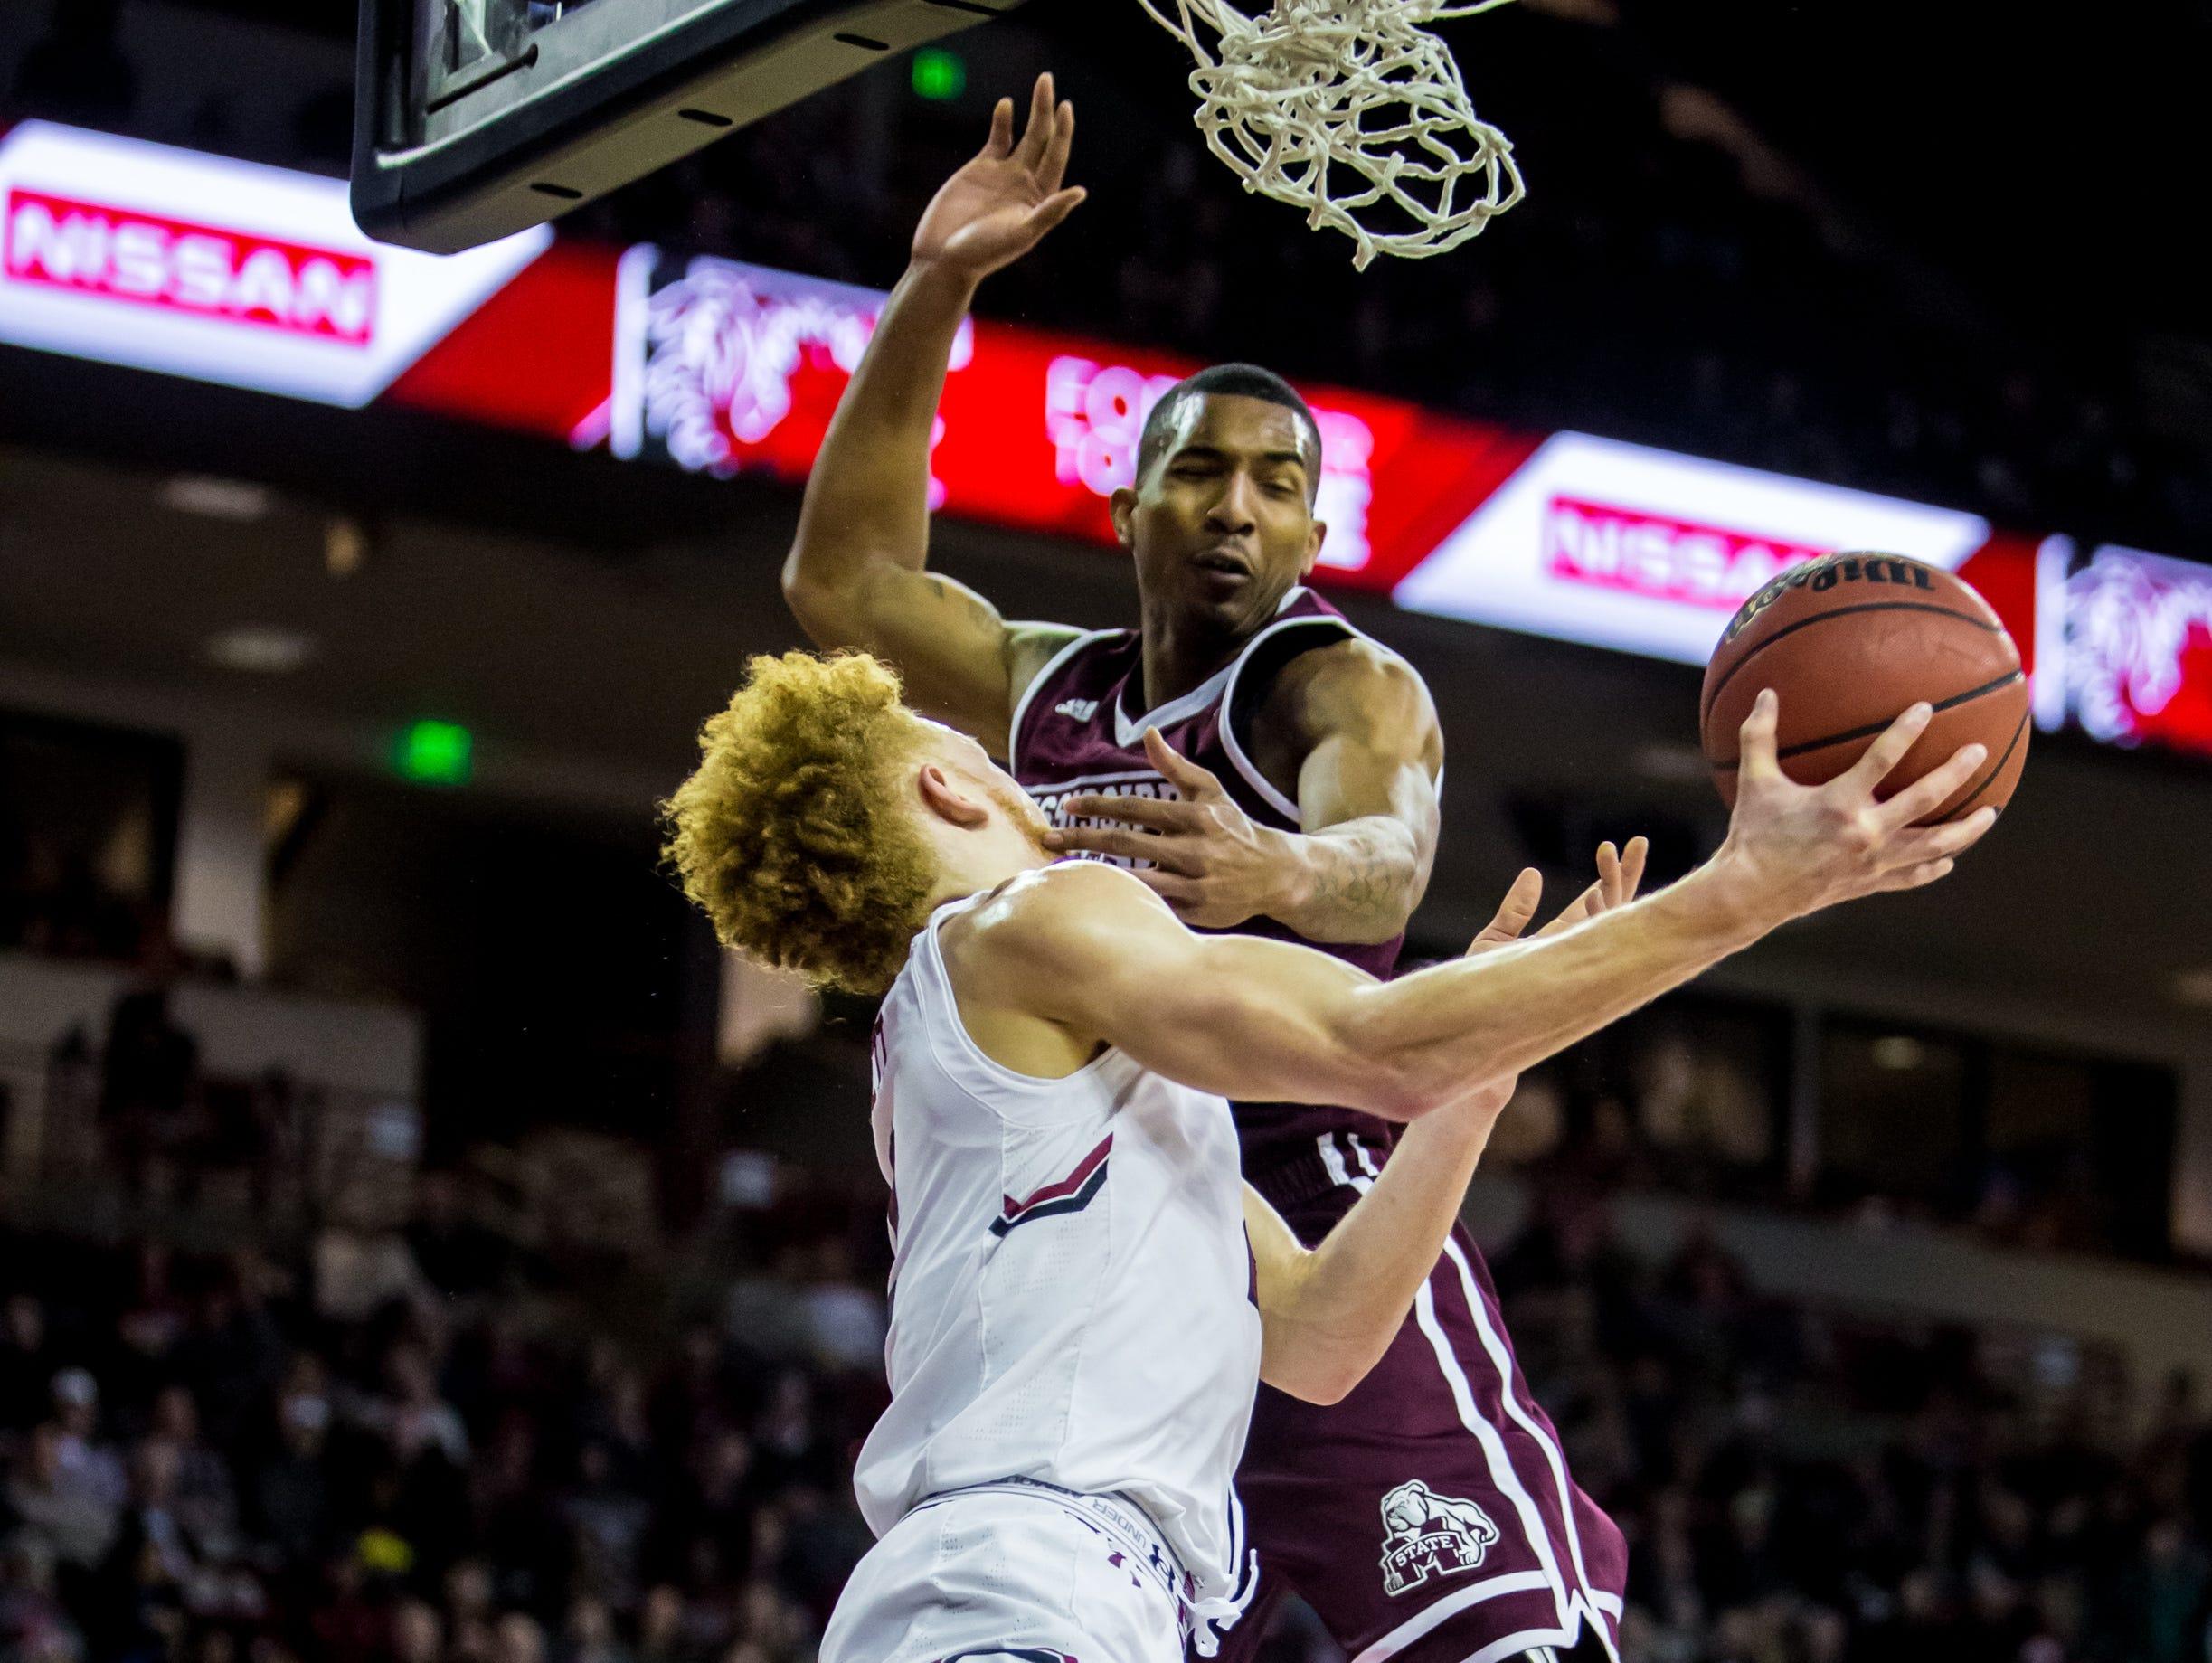 south carolina gamecocks basketball stumbles again at home against